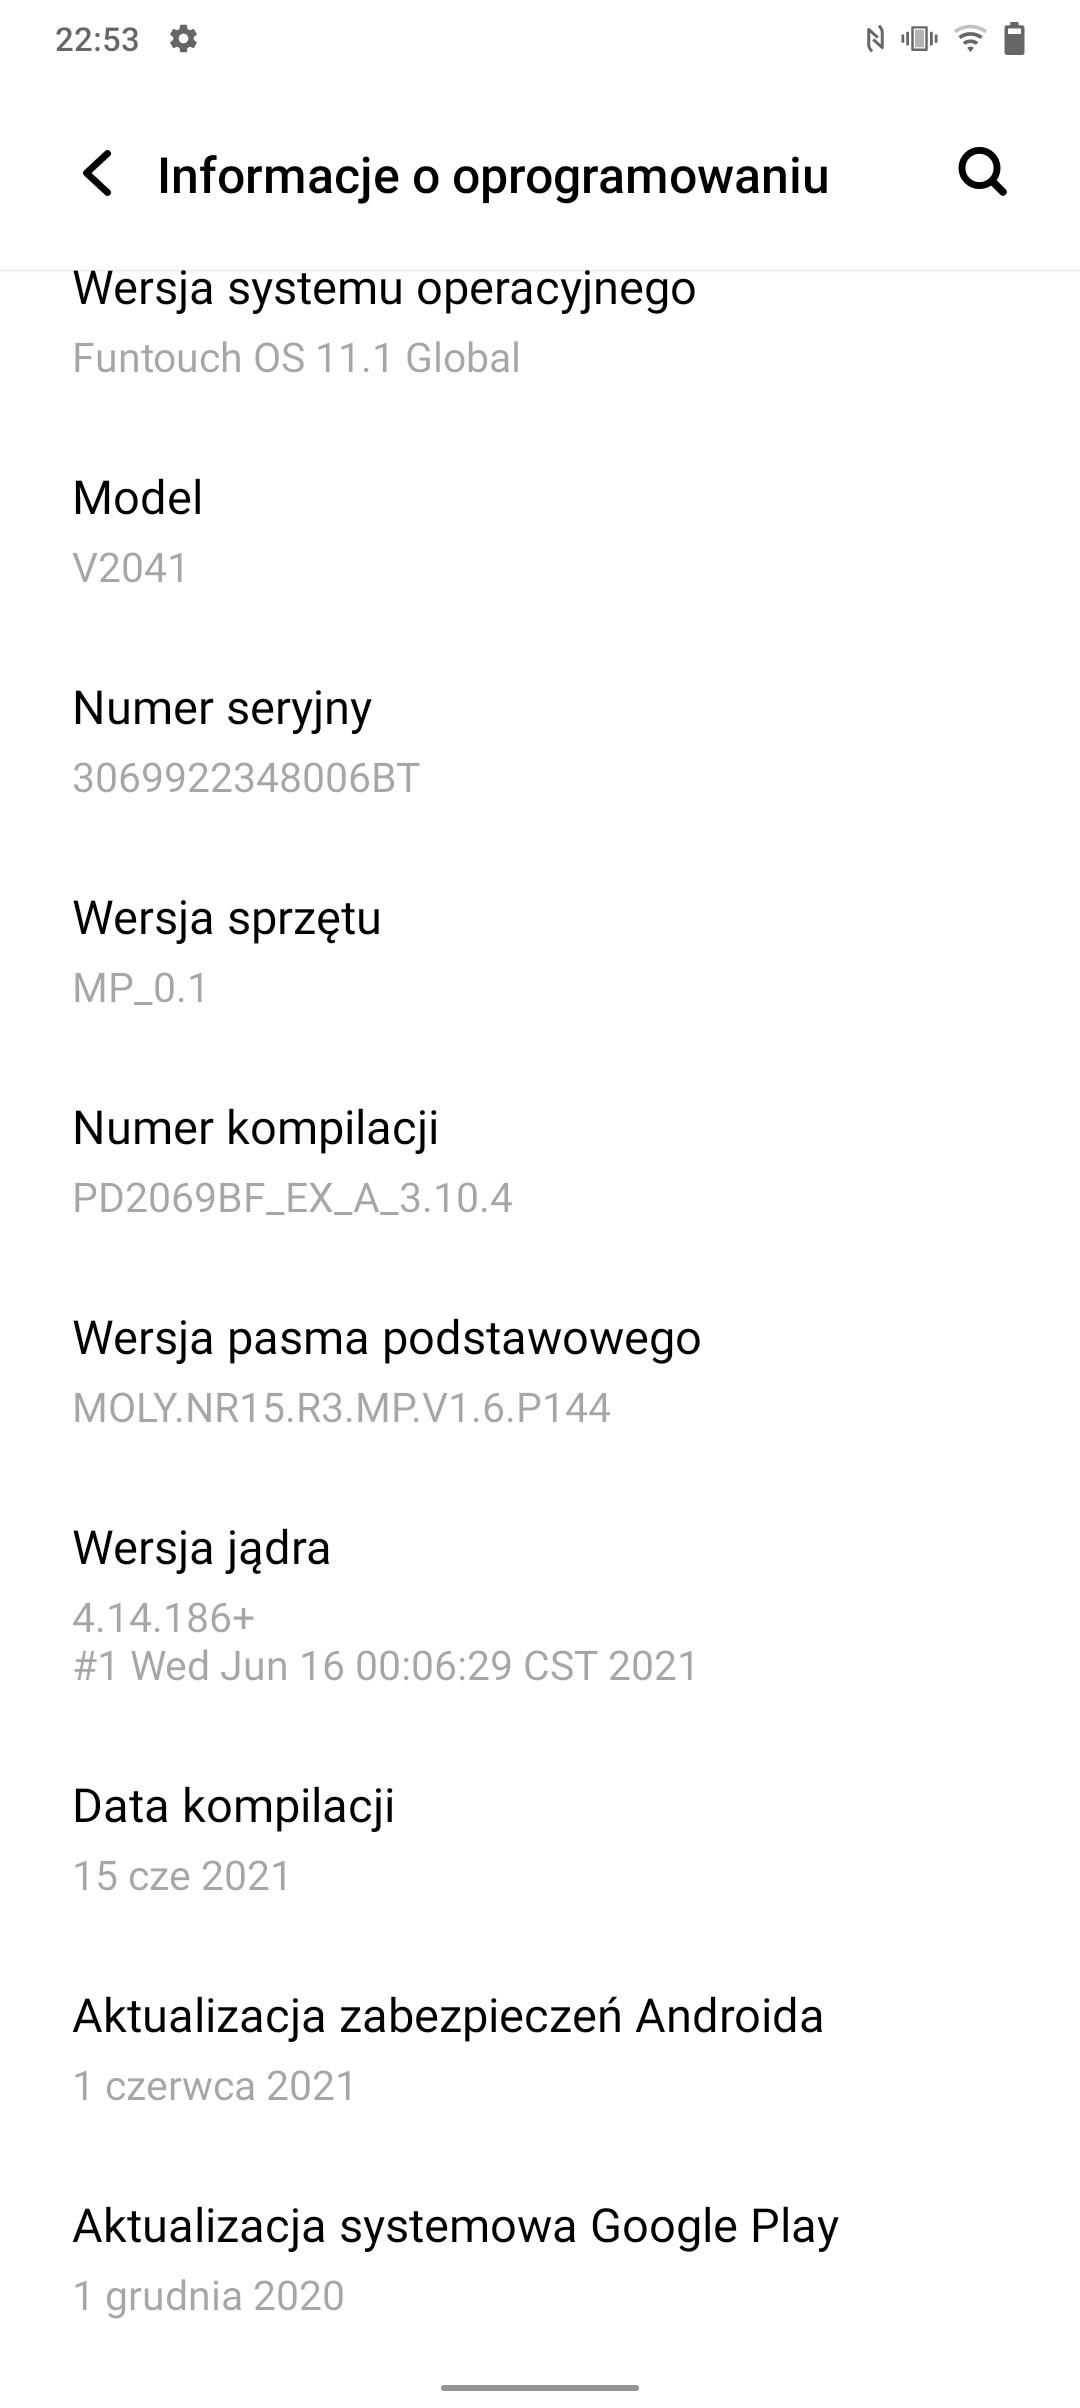 Recenzja Vivo Y72 5G - System Funtouch OS 11 - fot. Tabletowo.pl